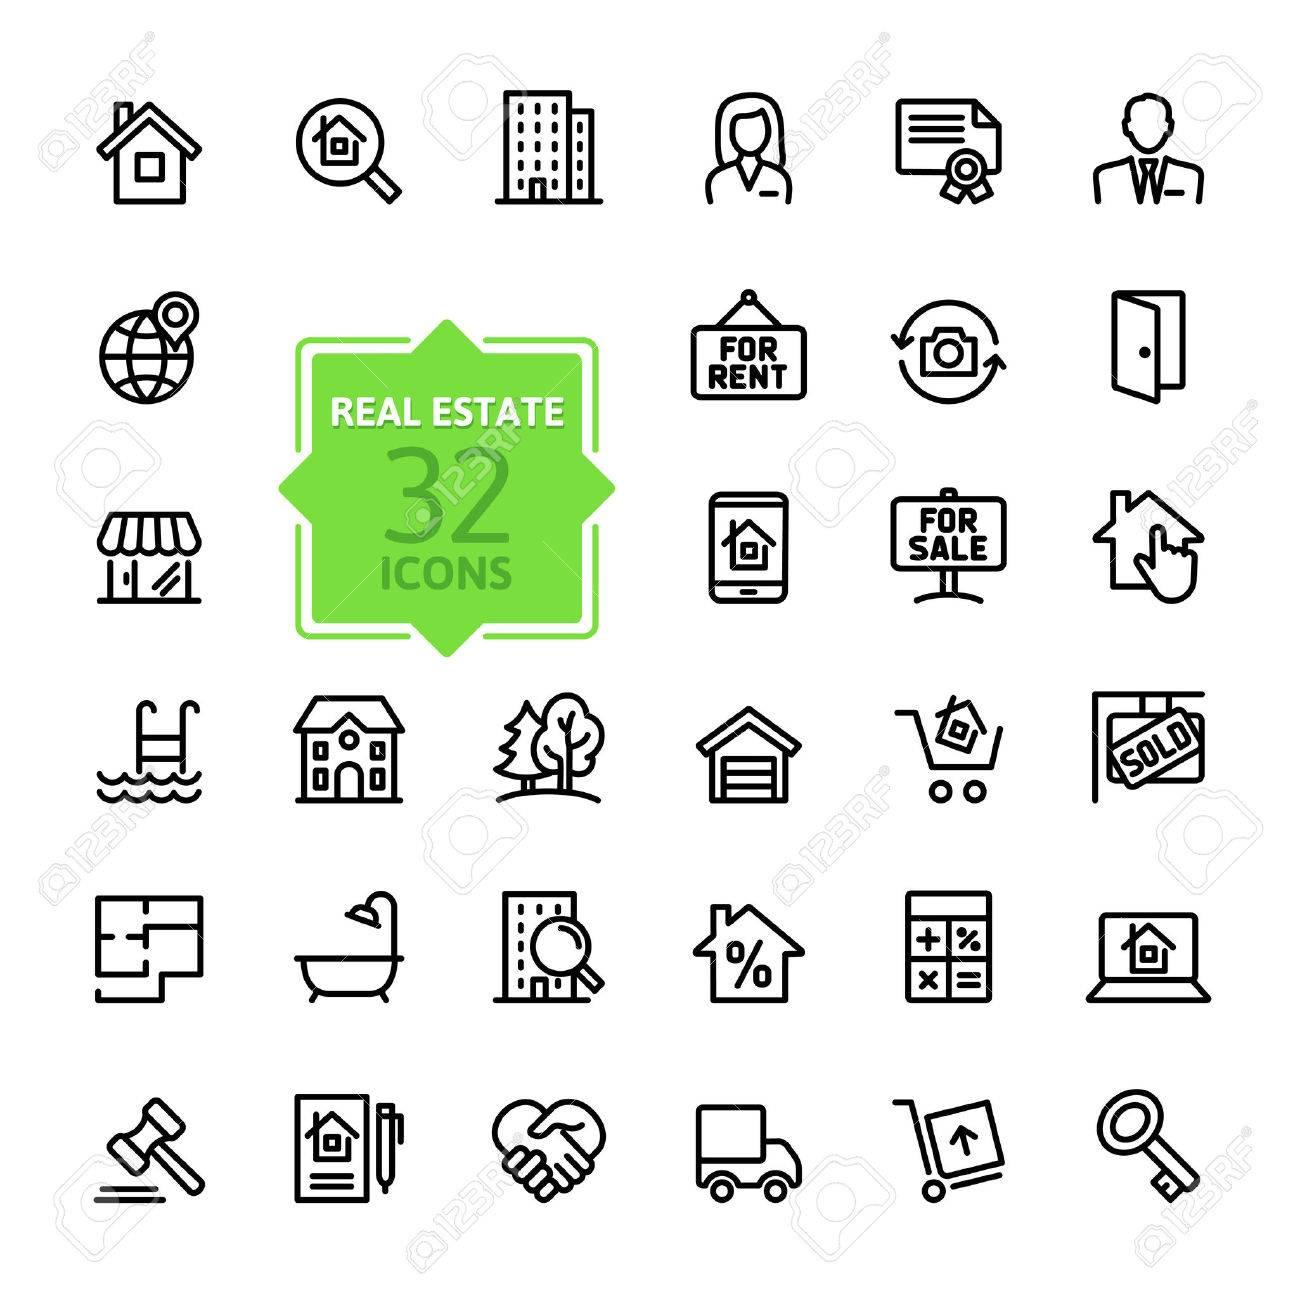 Outline web icons set - Real Estate, property - 37753667